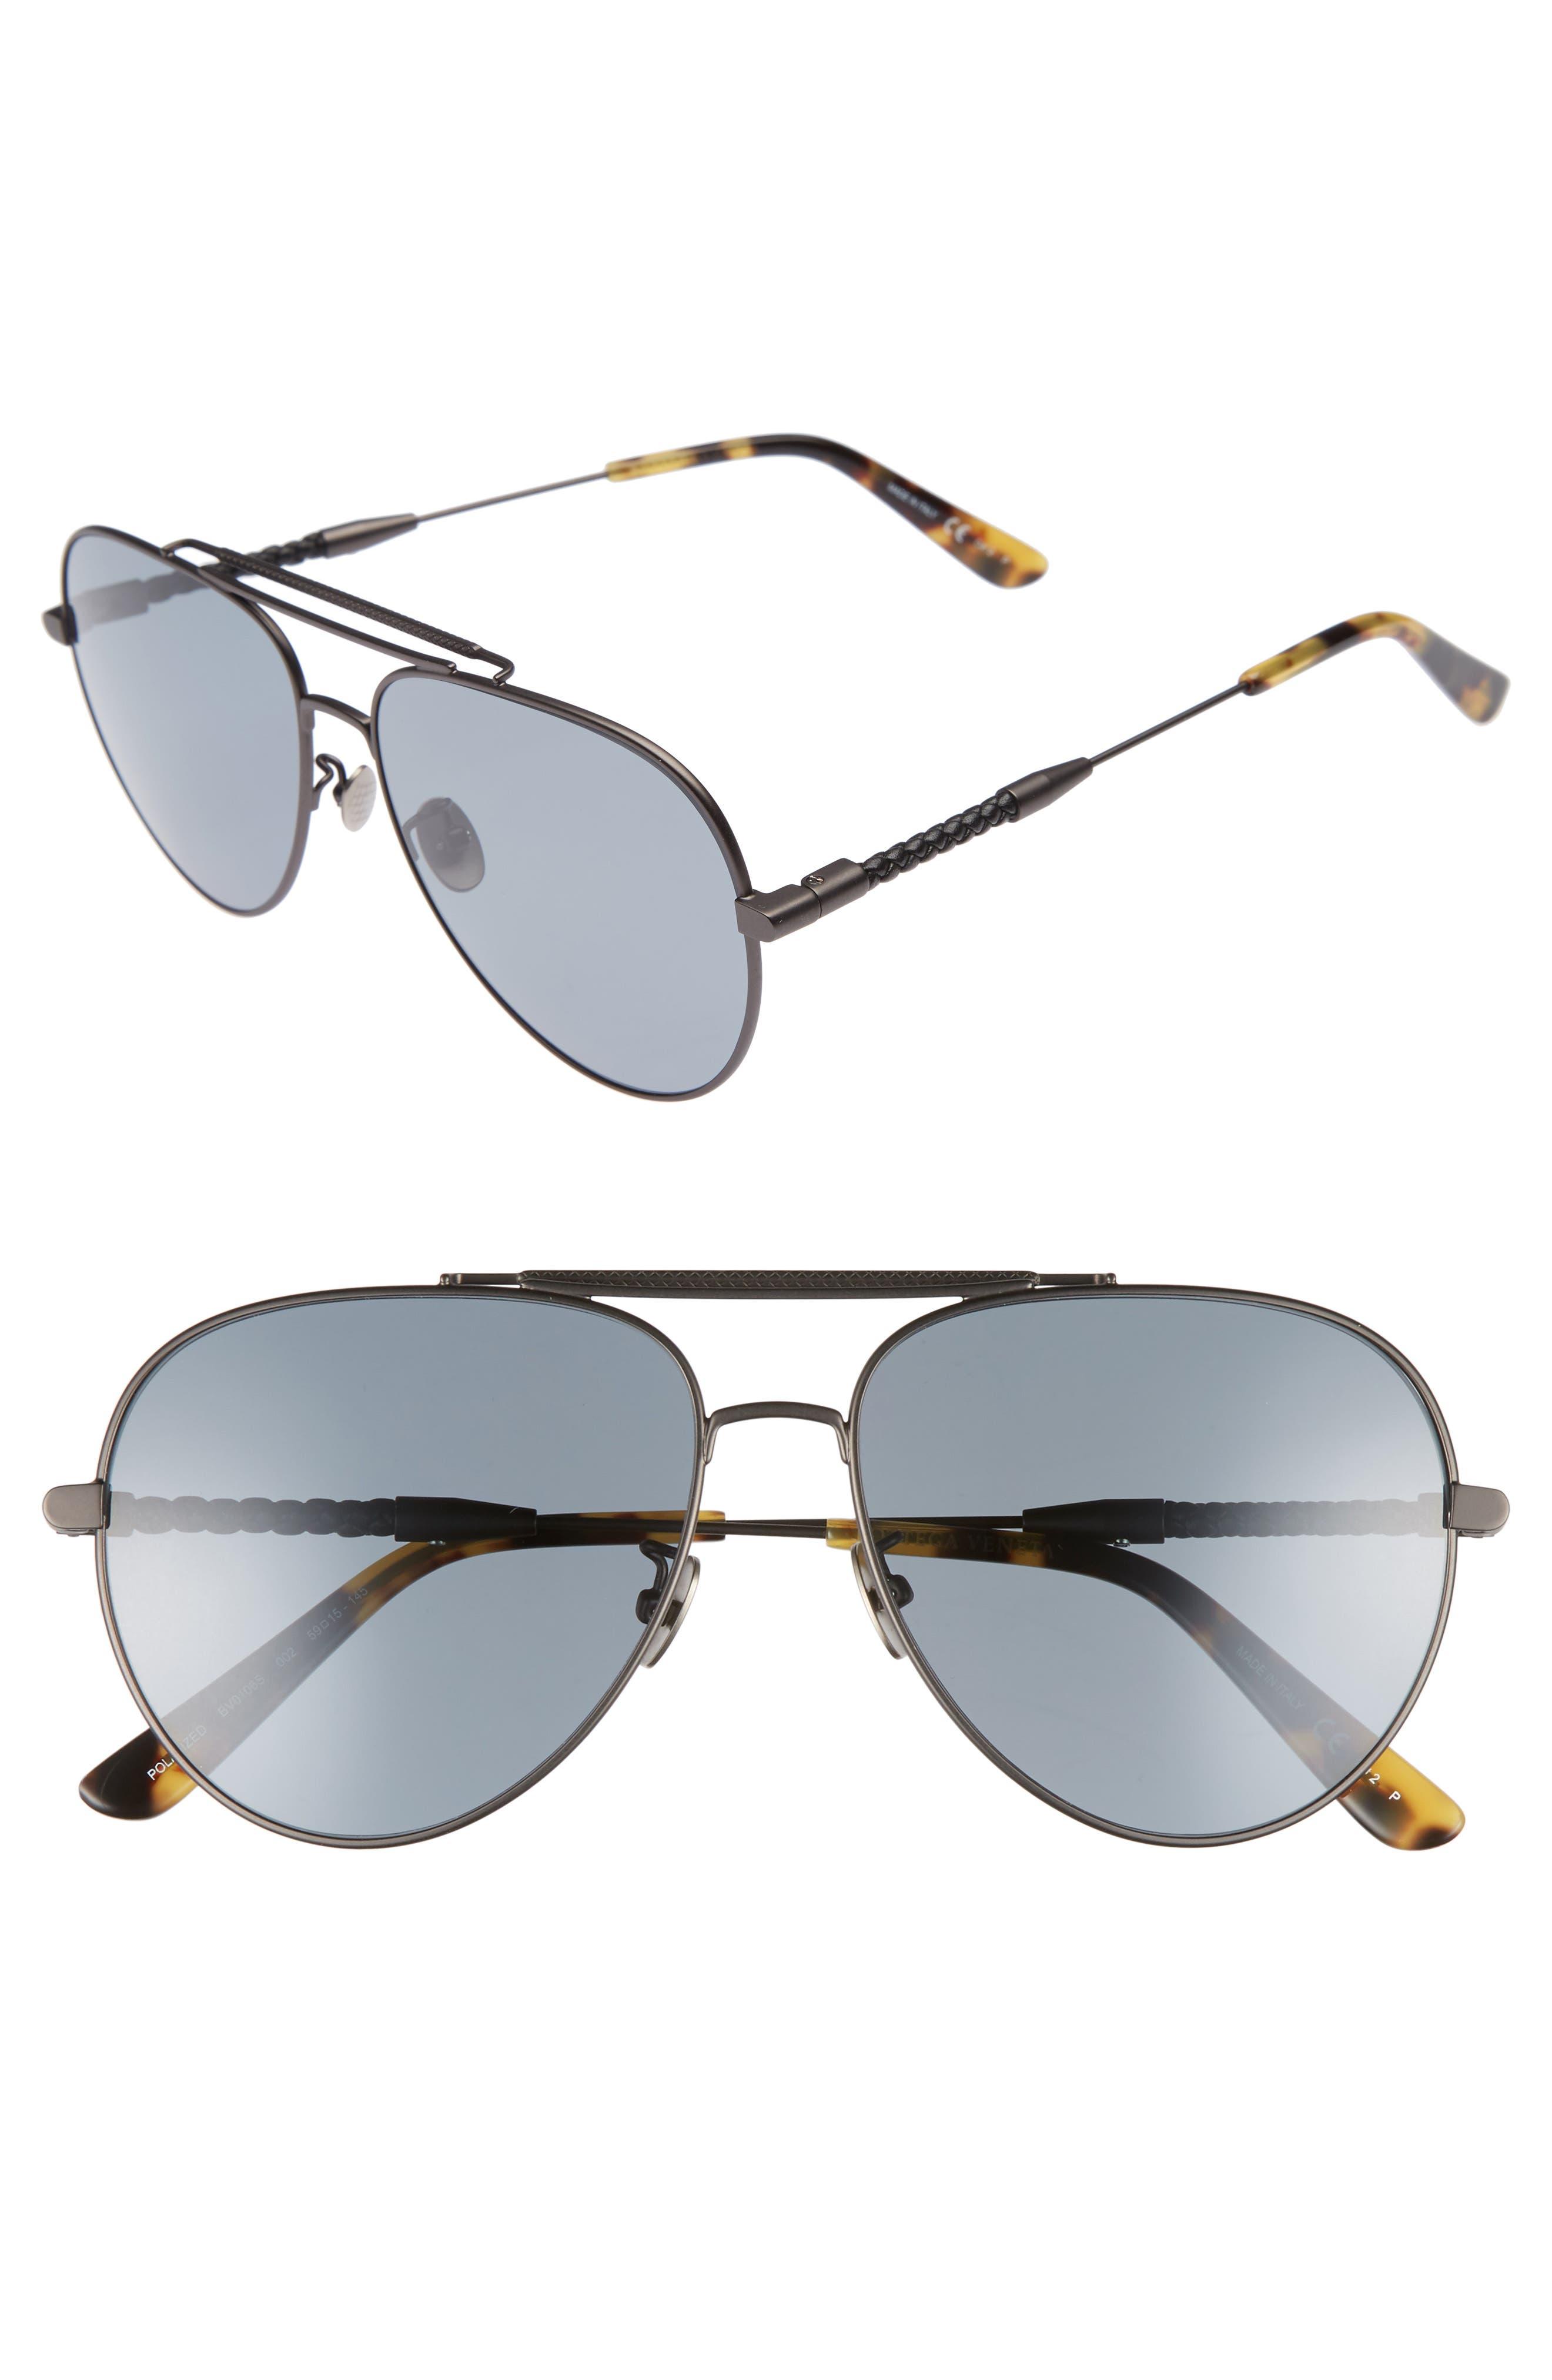 59m Polarized Aviator Sunglasses,                         Main,                         color, Ruthenium